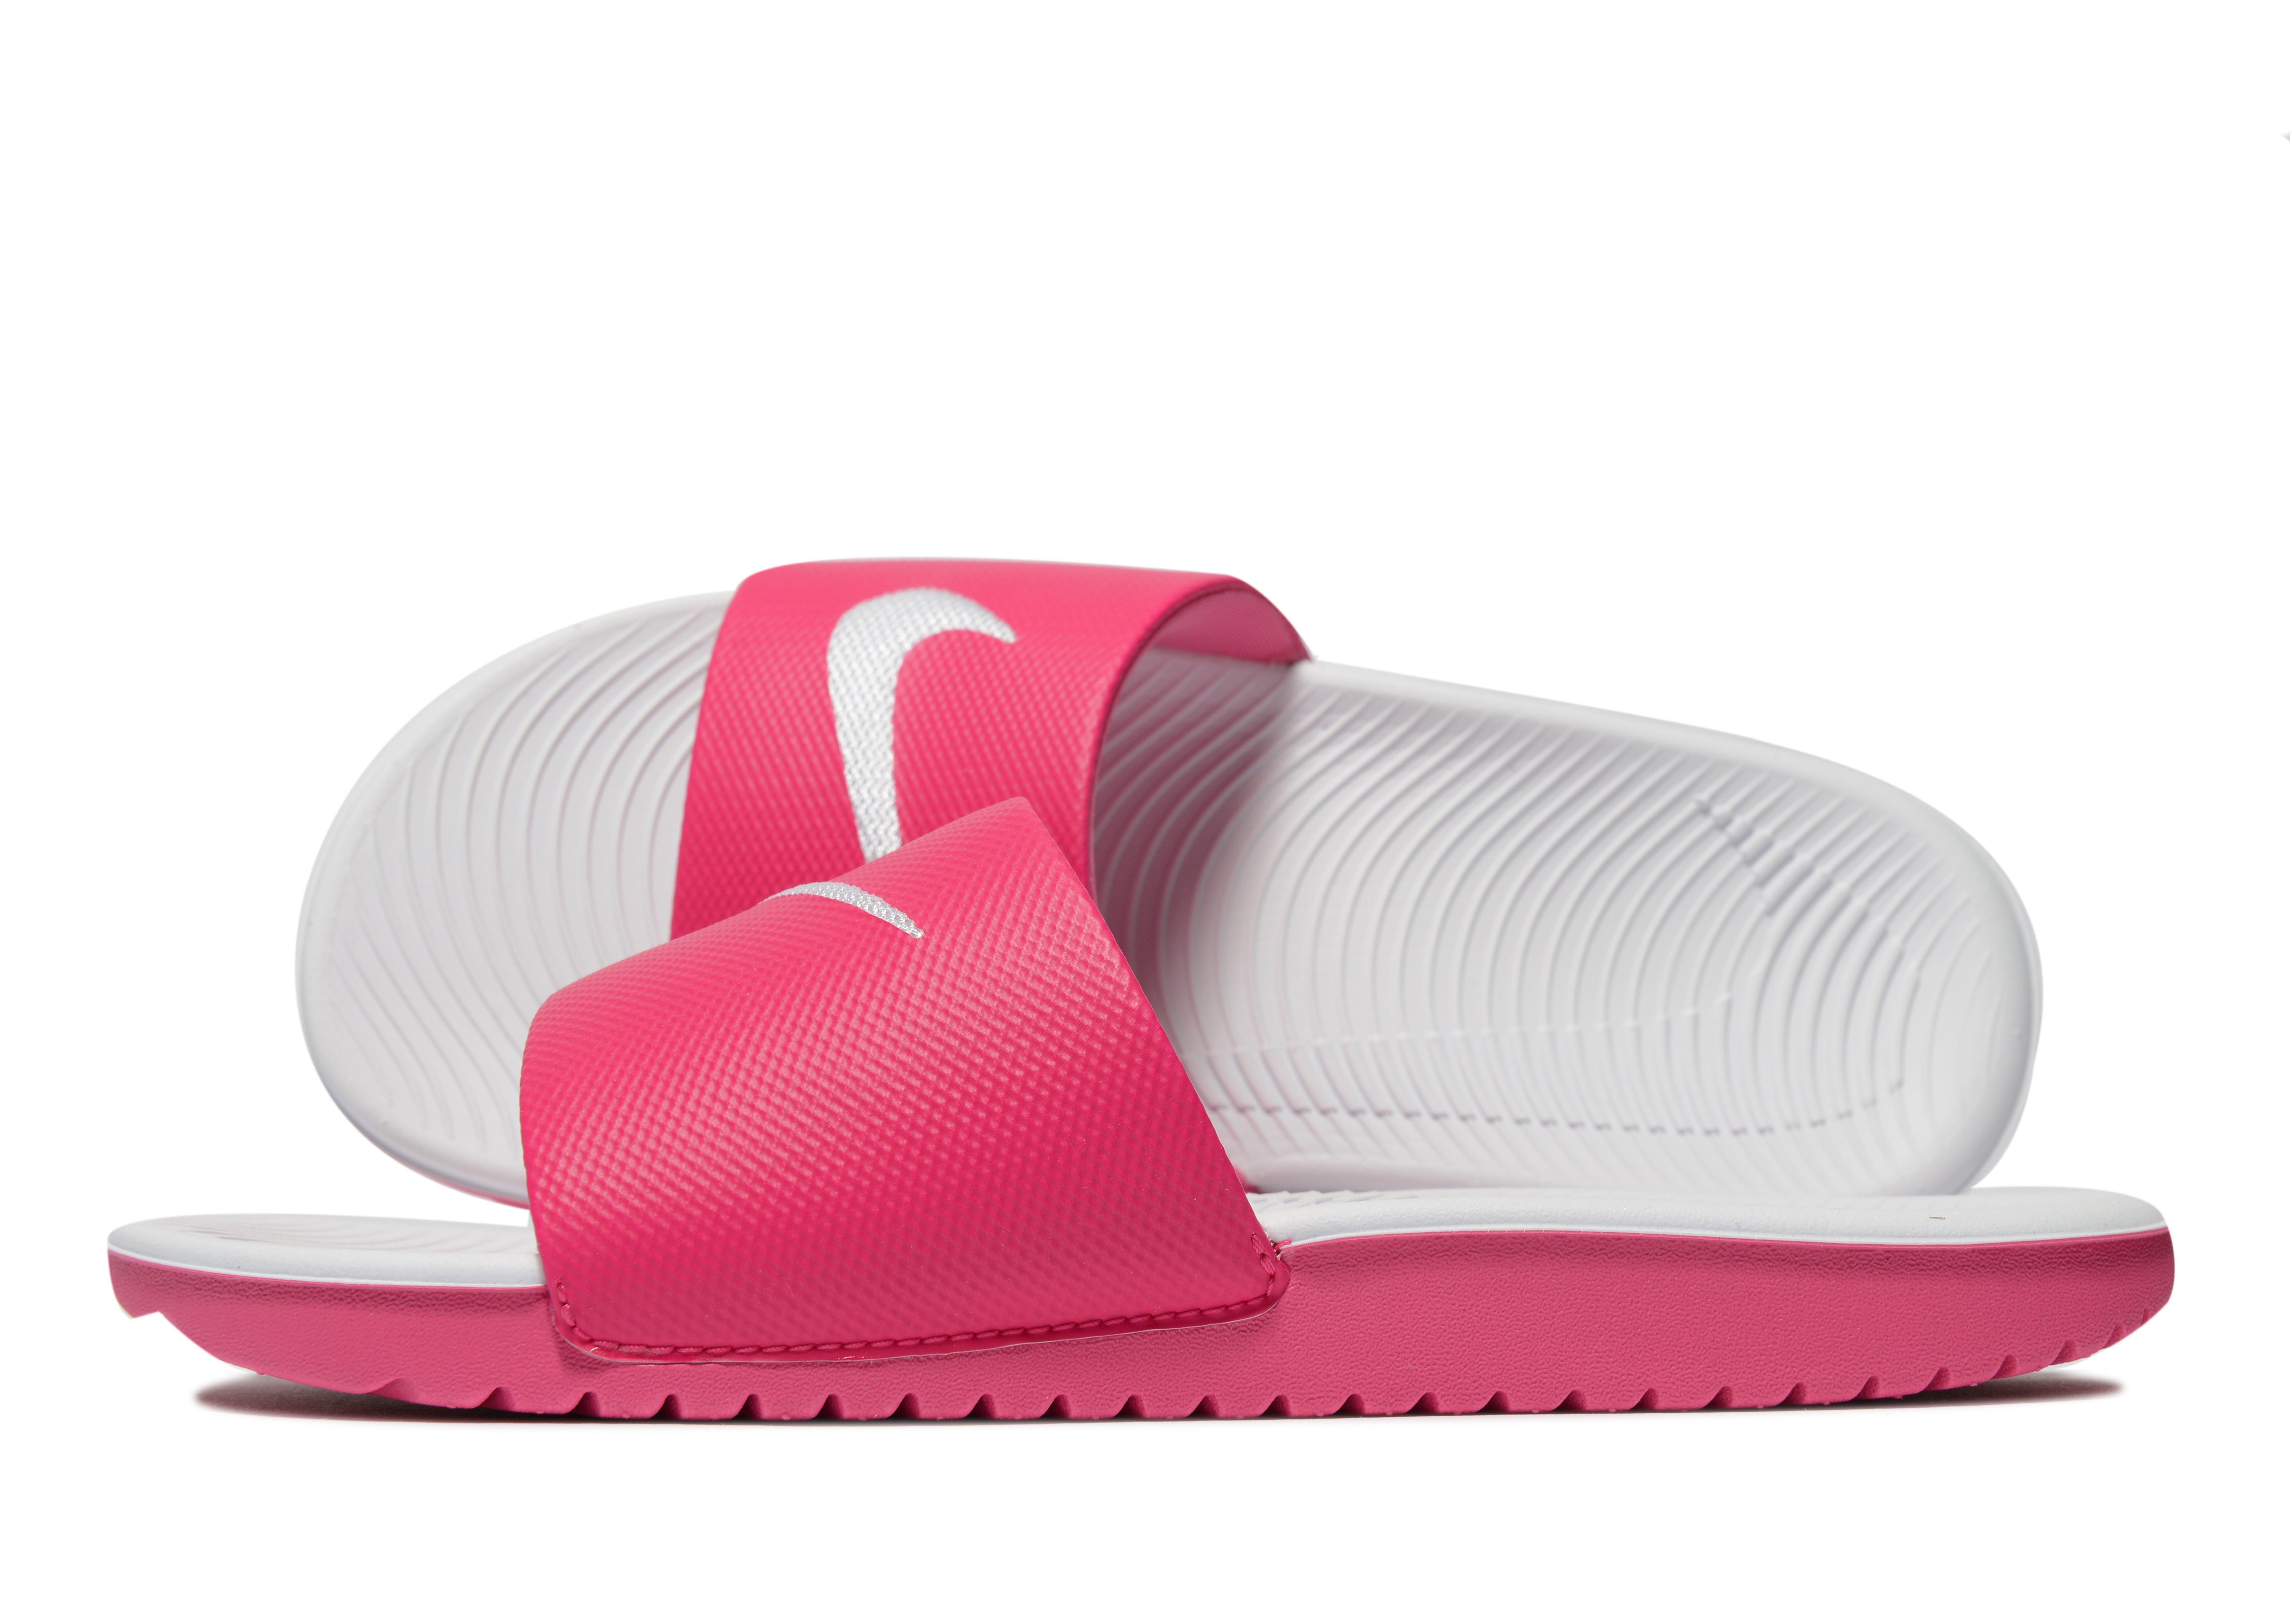 reputable site 6e9f5 8eec5 Nike Kawa Slides Junior in Pink - Lyst